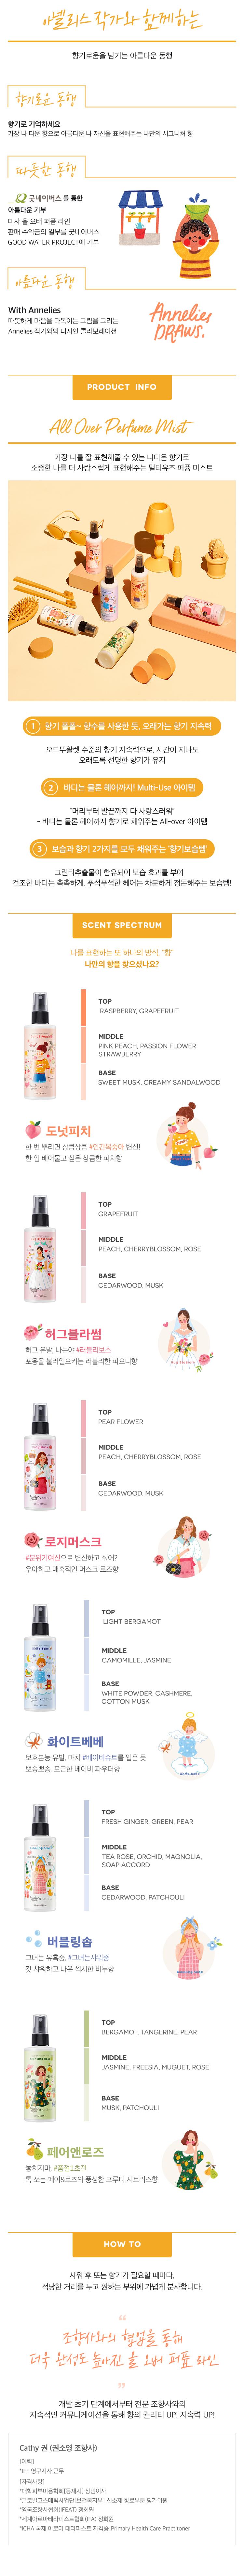 Xịt Khoáng Hương Nước Hoa MISSHA All Over Perfume Mist #Hug Blossom 120ml